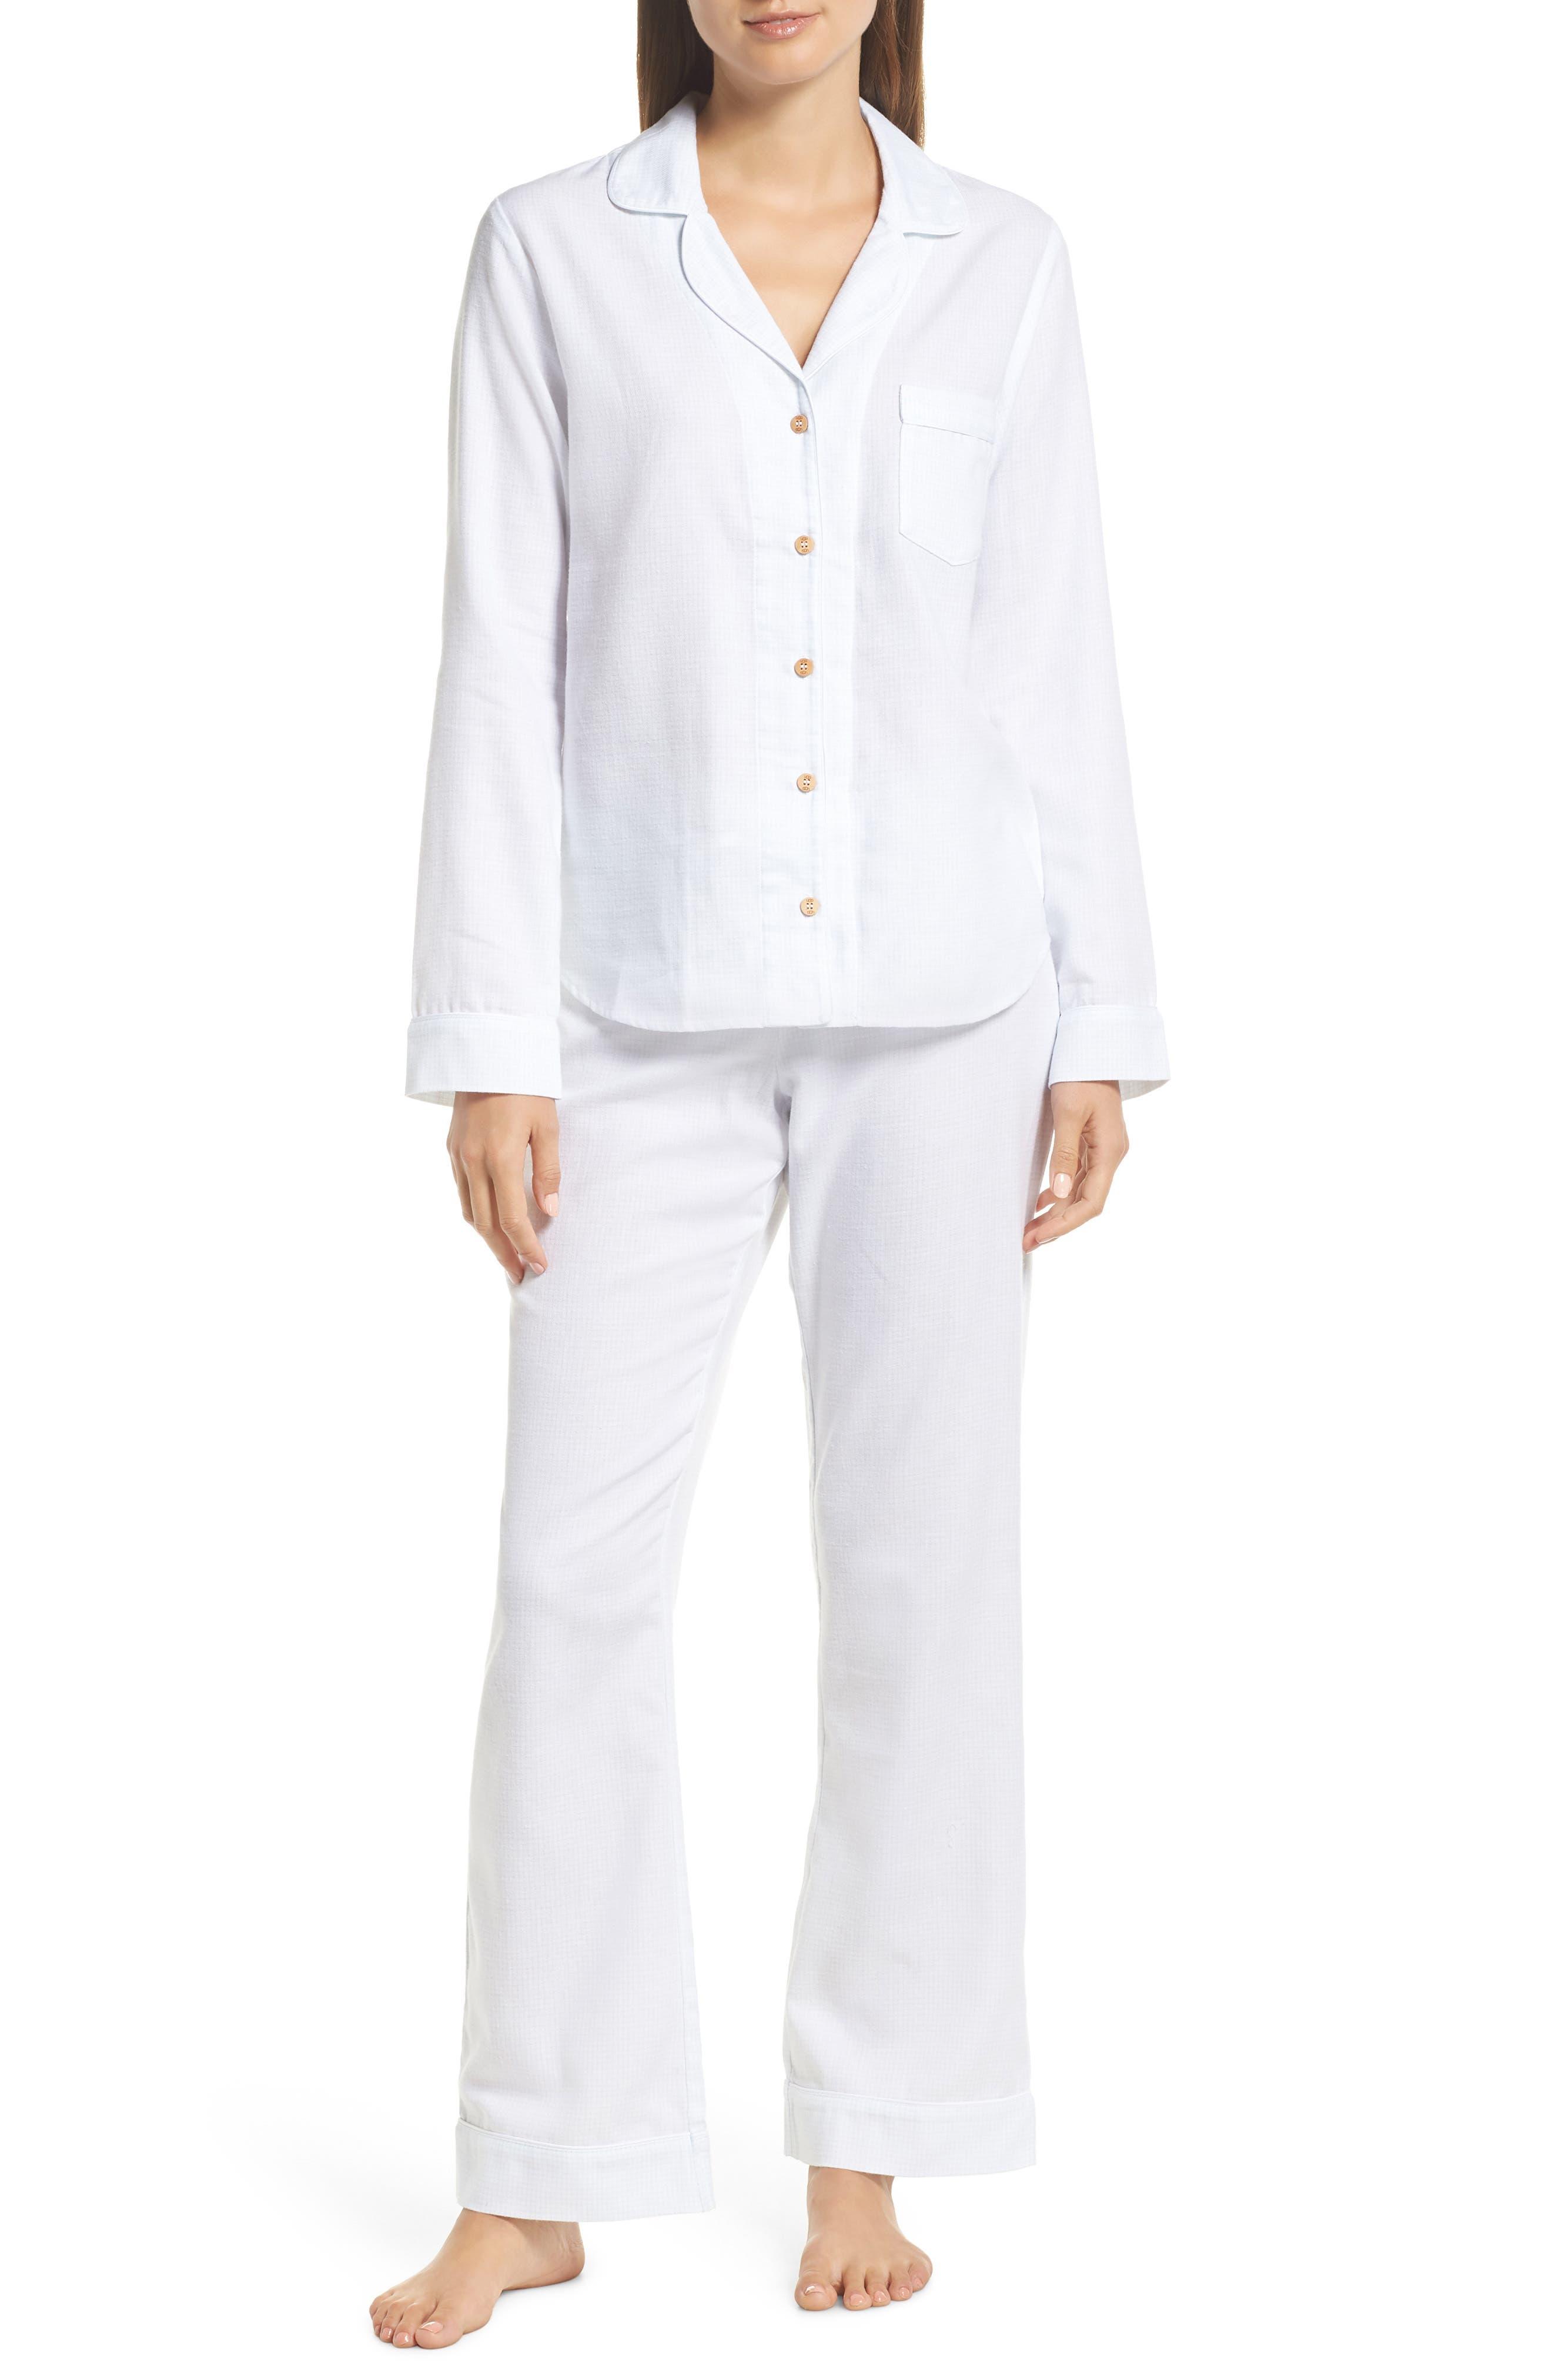 Raven Plaid Pajamas,                             Main thumbnail 1, color,                             WHITE / SKY BLUE CHECK